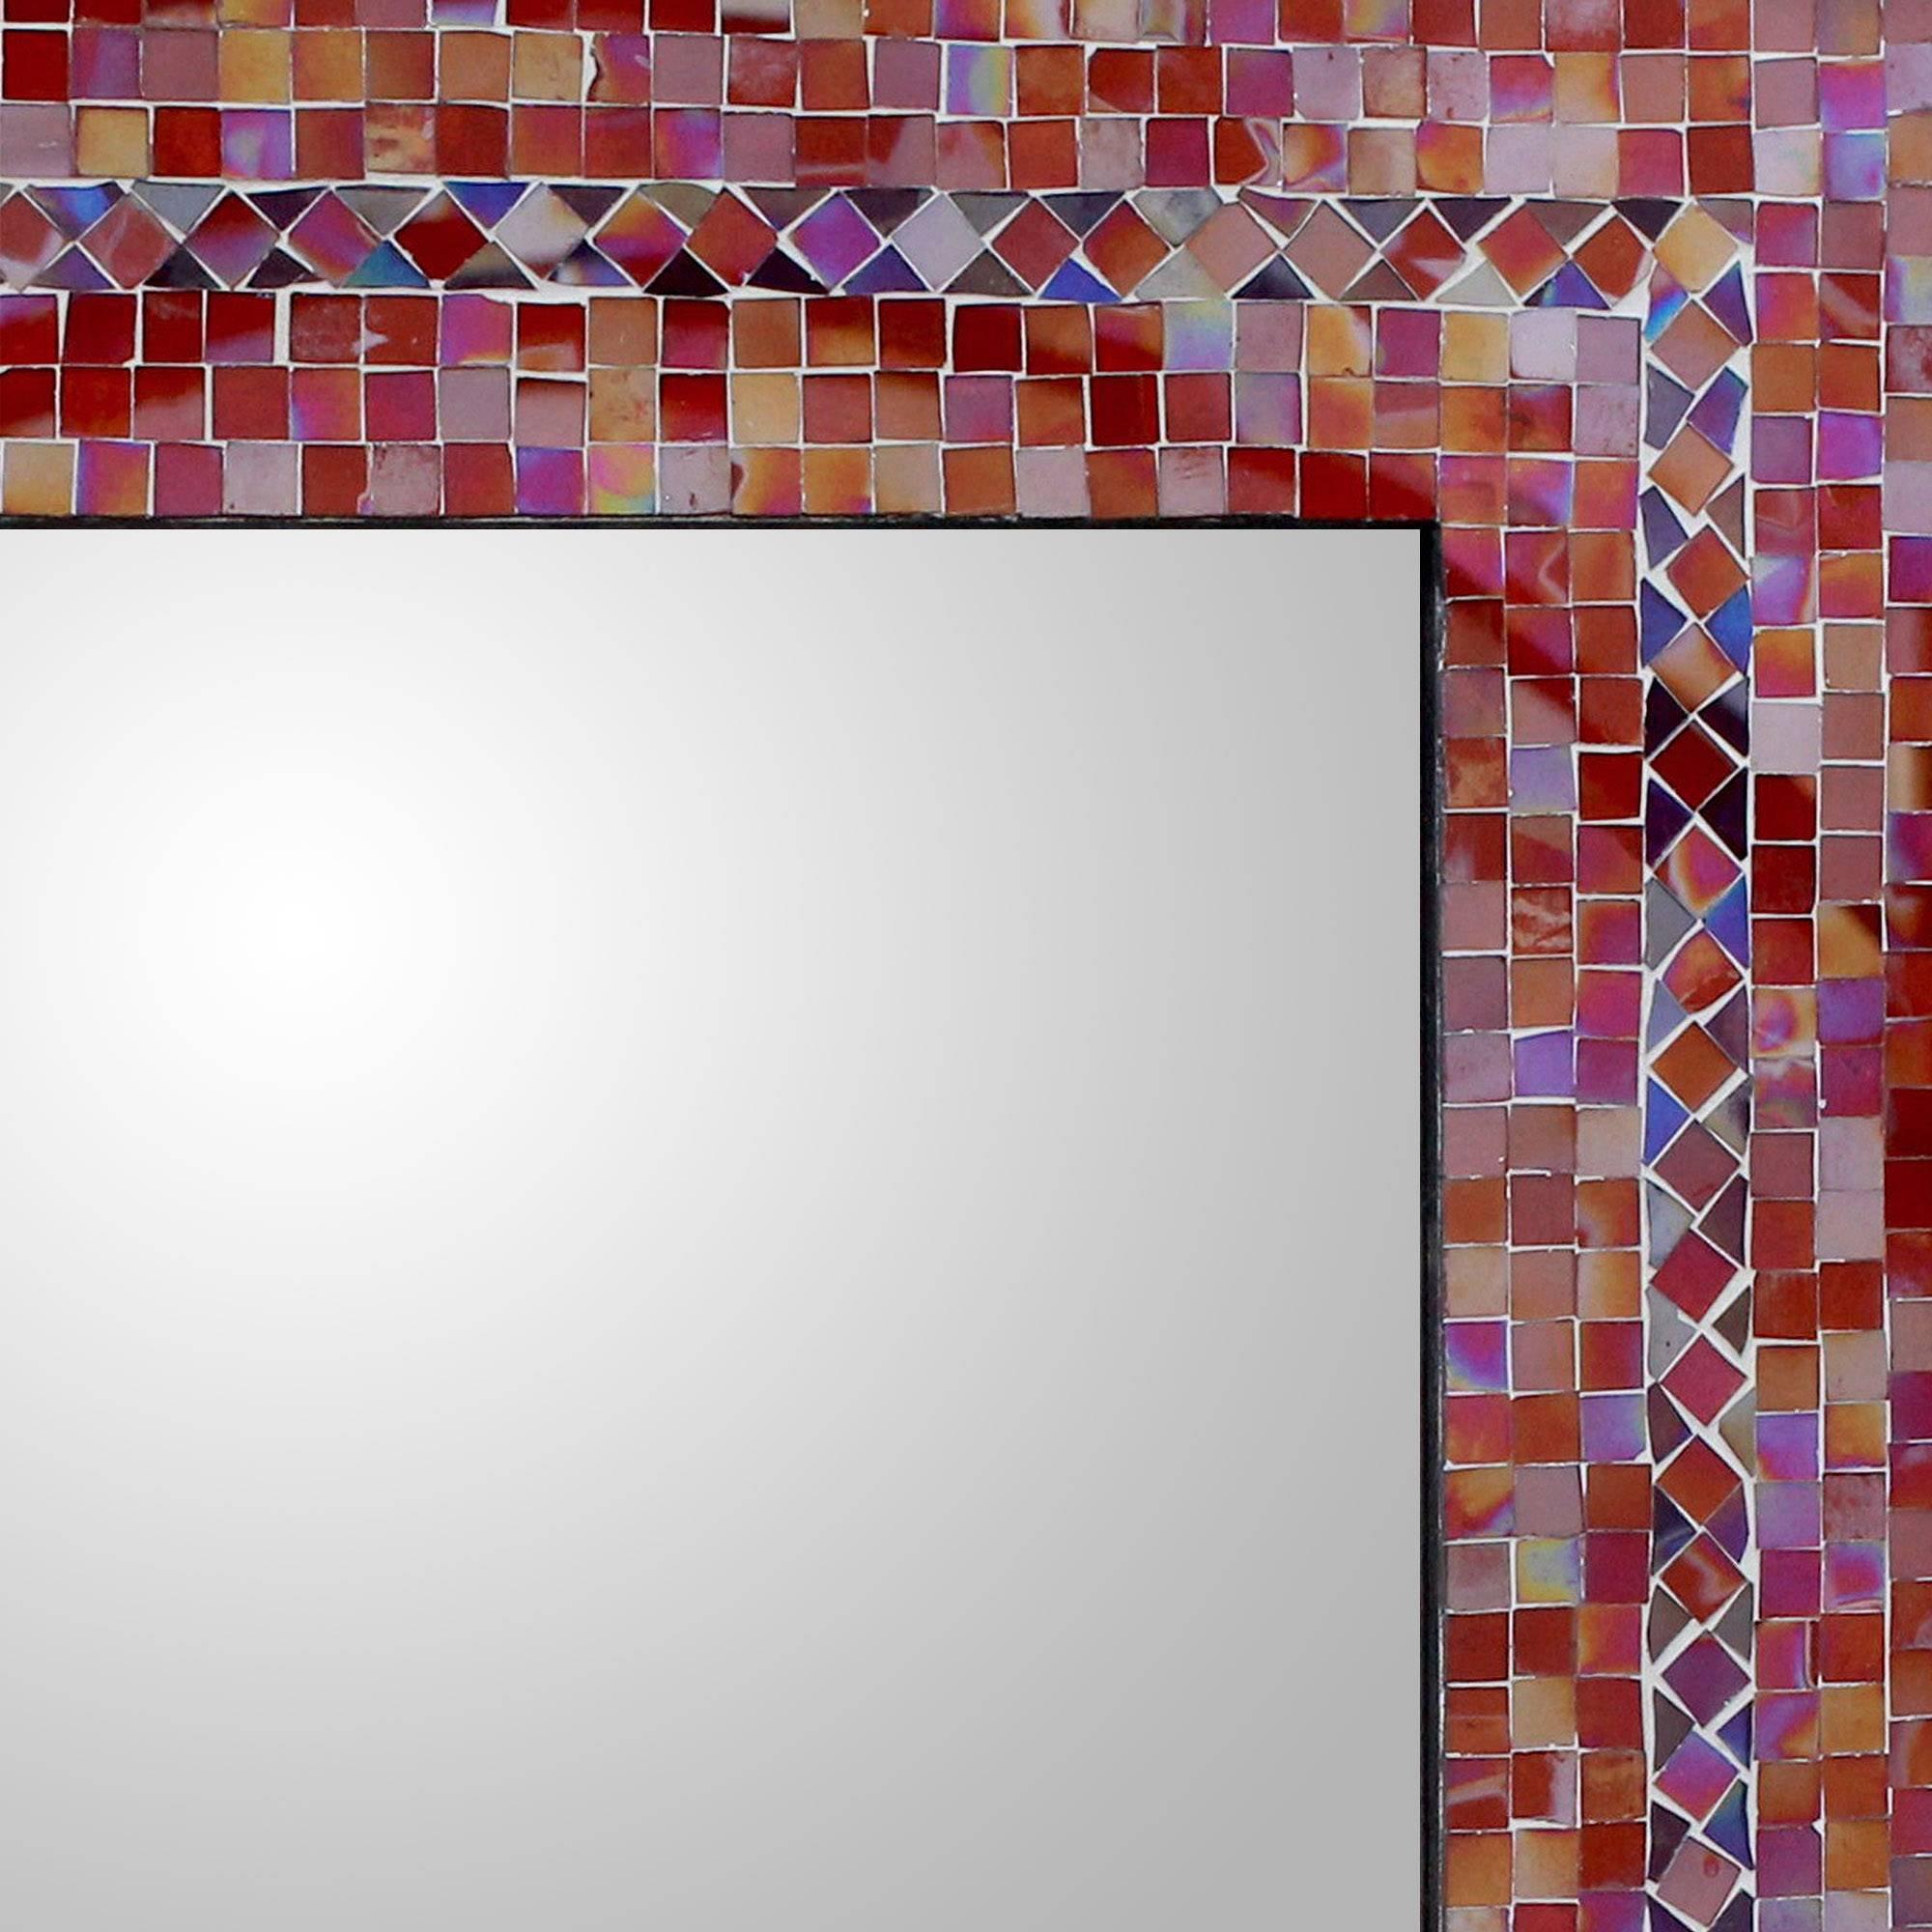 NOVICA Orange and Red Glass Mosaic Wood Framed Rectangular Decorative Wall Mirror 'India Sunset' (large) by NOVICA (Image #2)